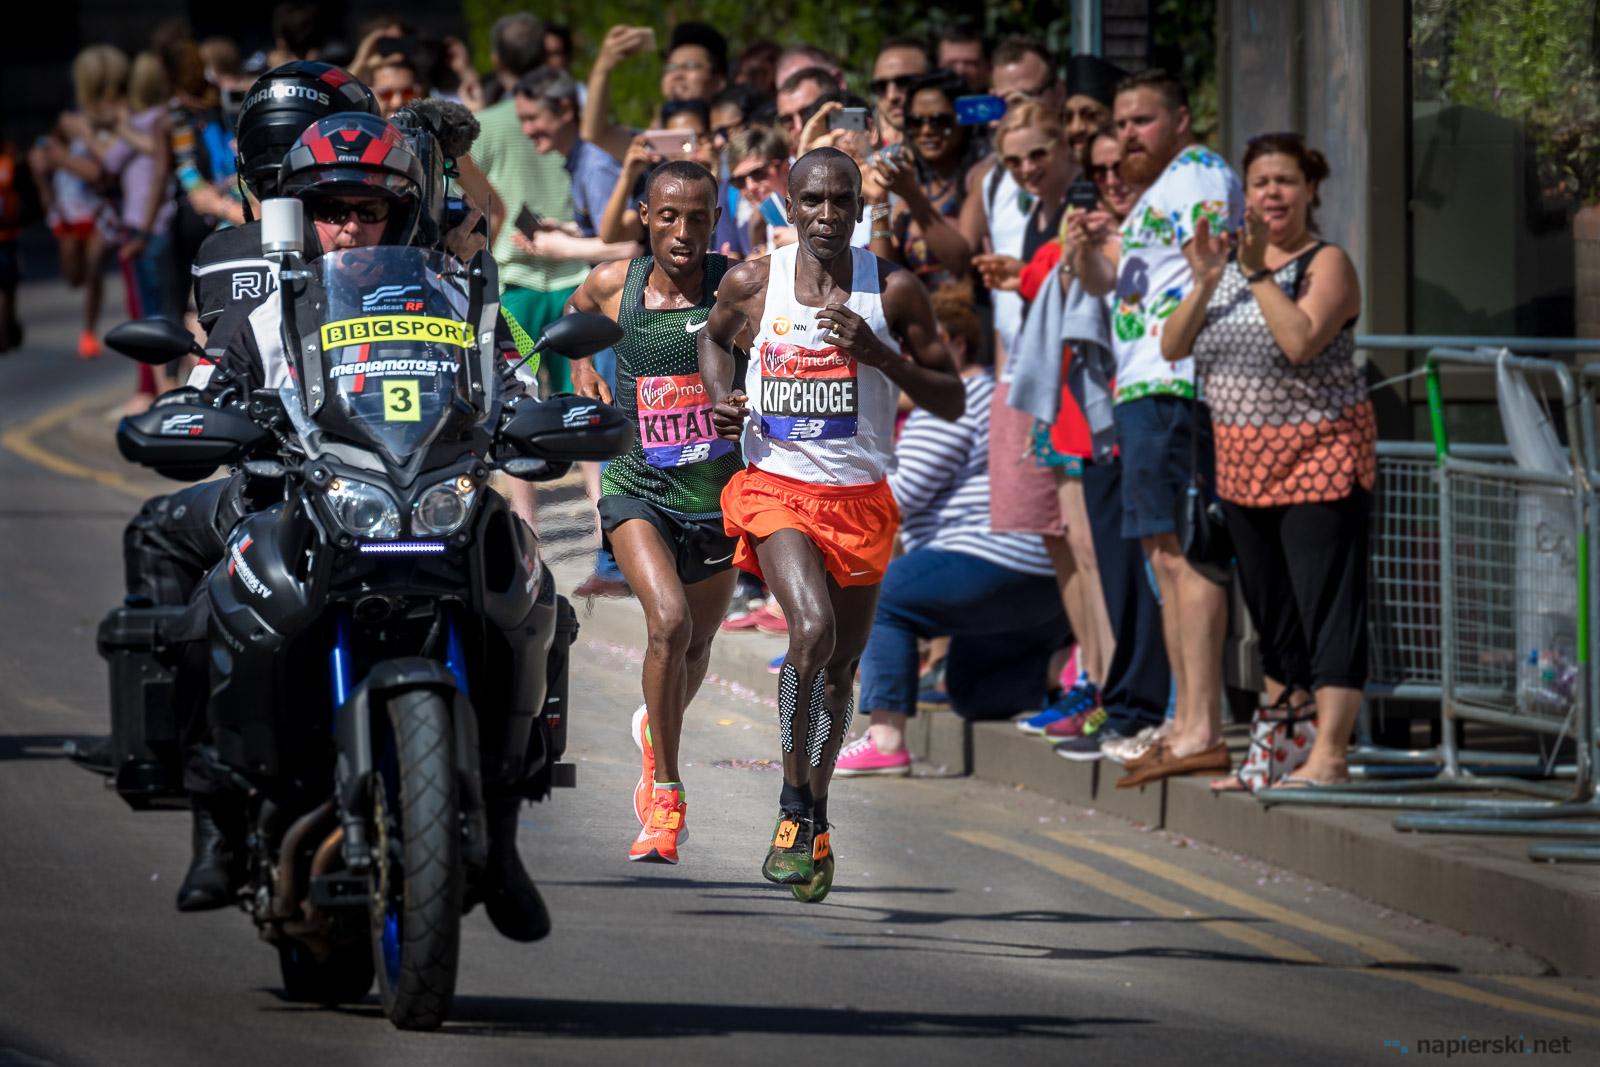 April 2018, London Marathon, Isle of Dogs, London, UK